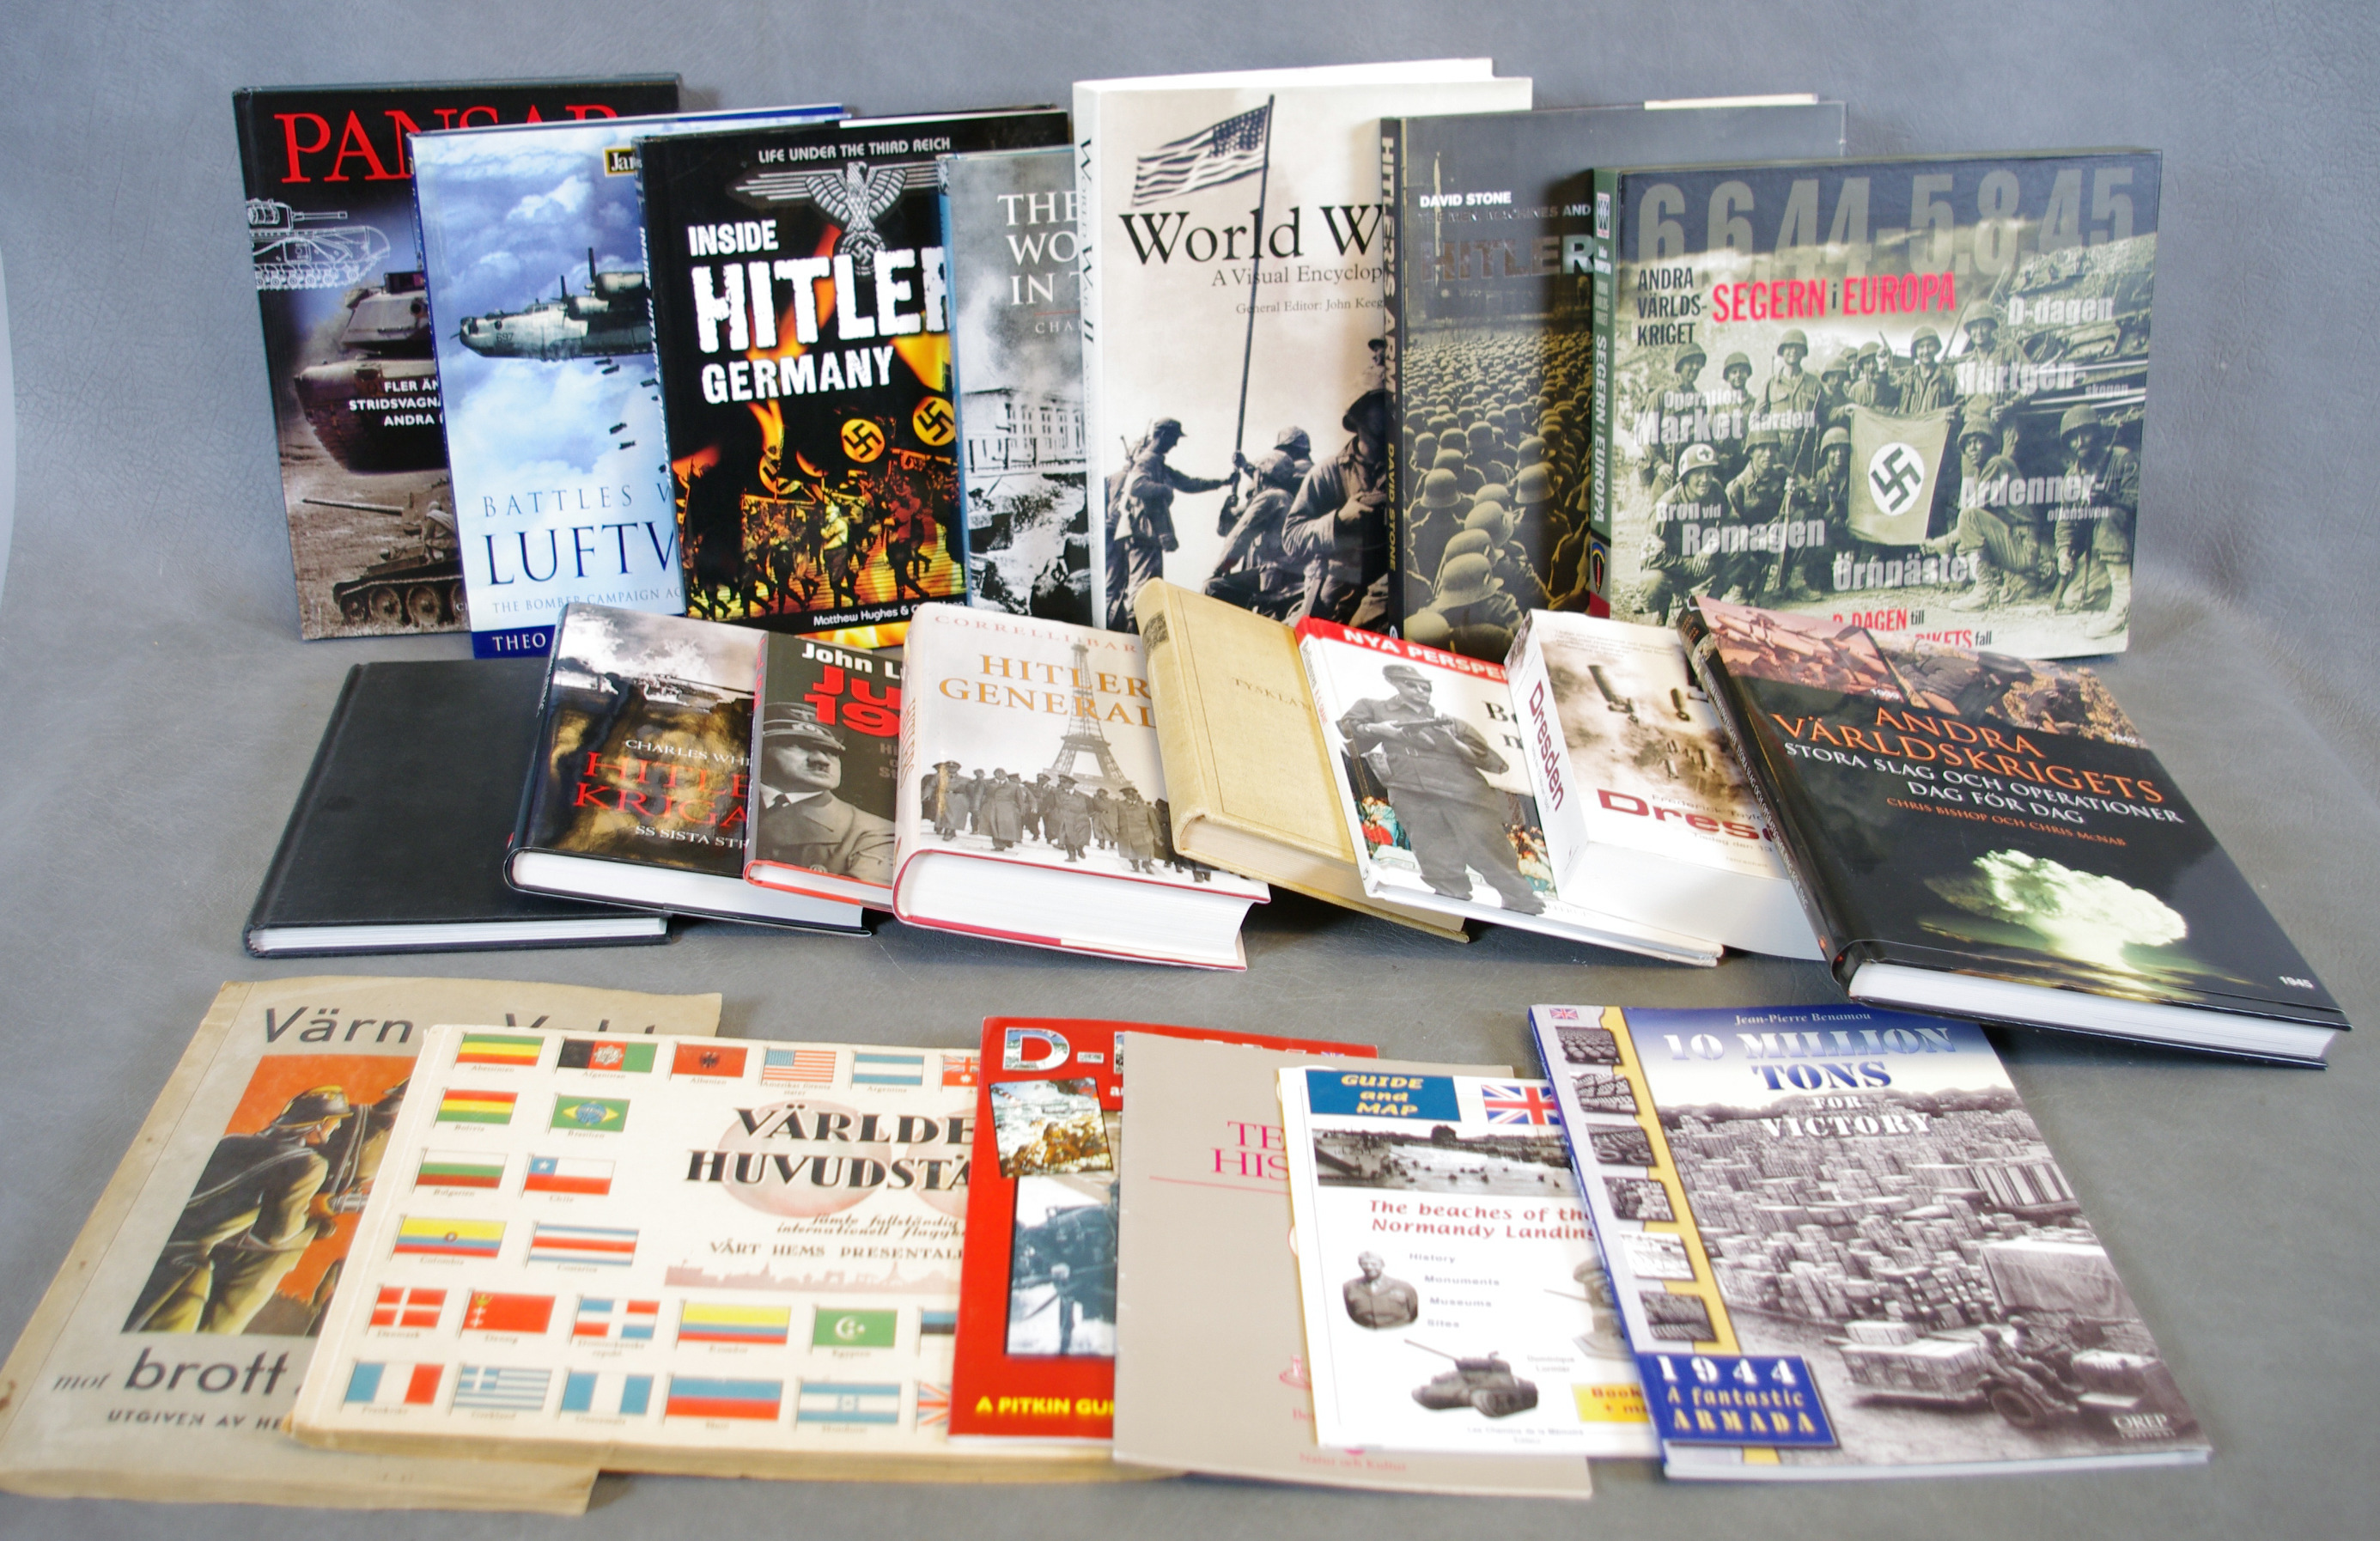 Karta Europa Andra Varldskriget.Bilder For 64212 Litteratur Andra Varldskriget Samt Kartor